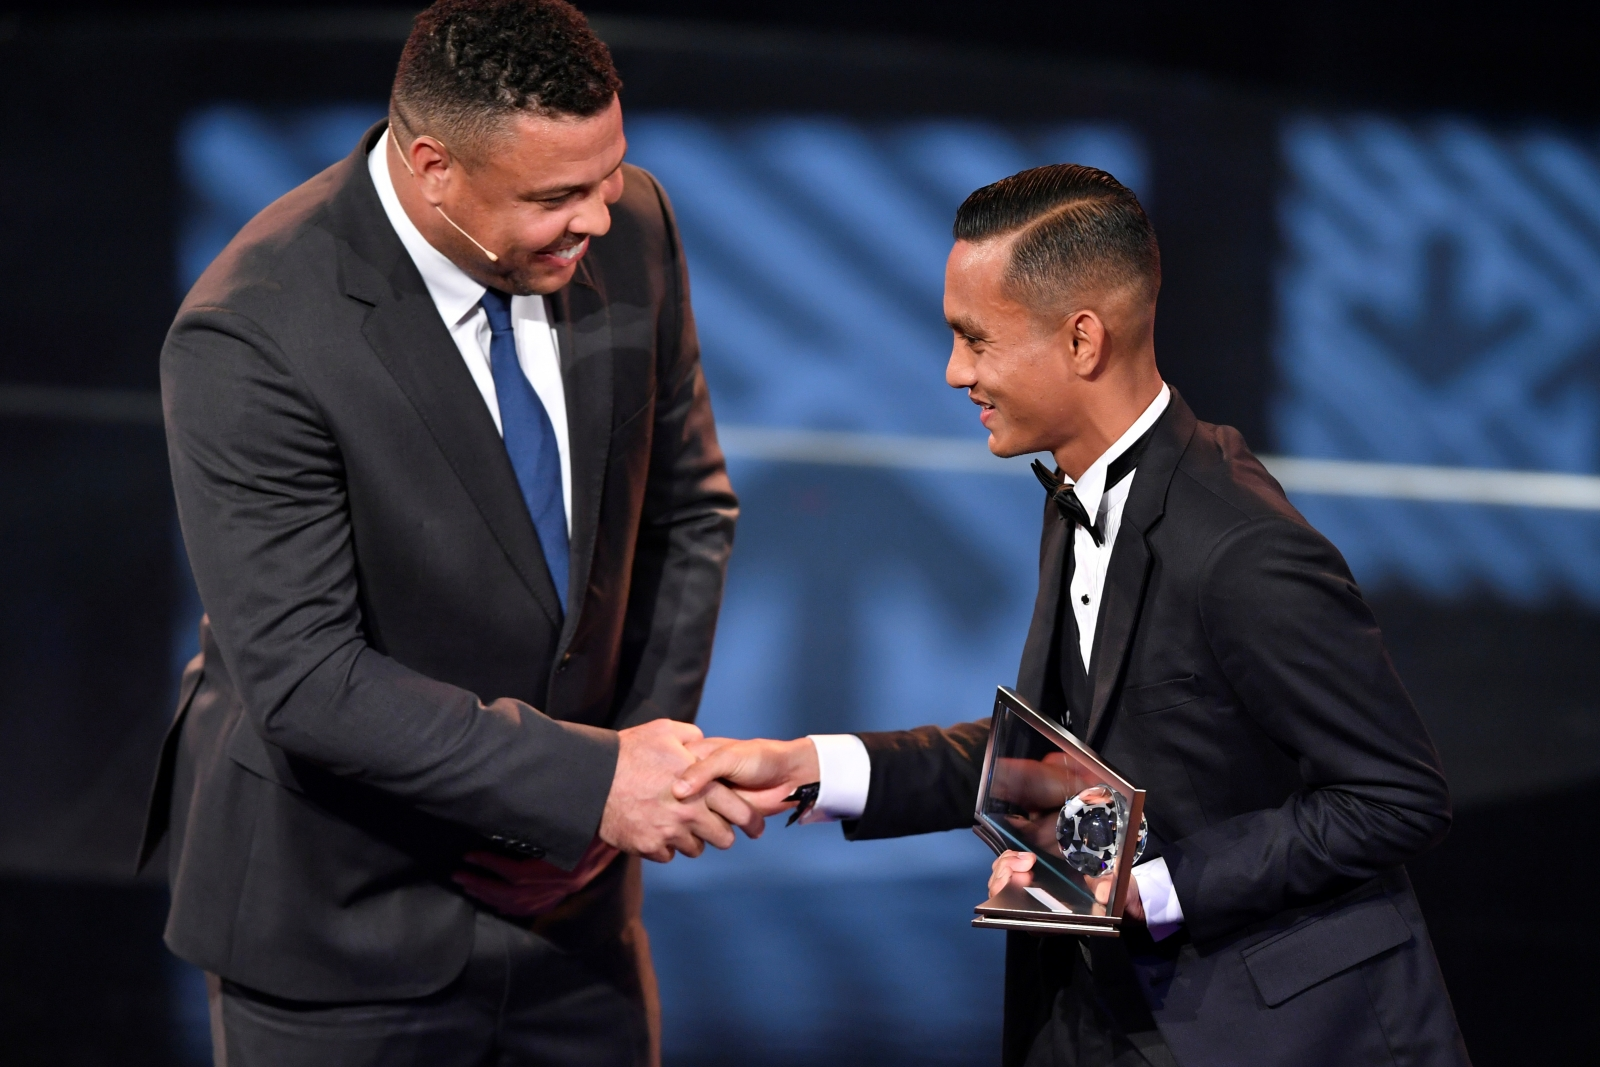 Ronaldo and Mohd Faiz Subri